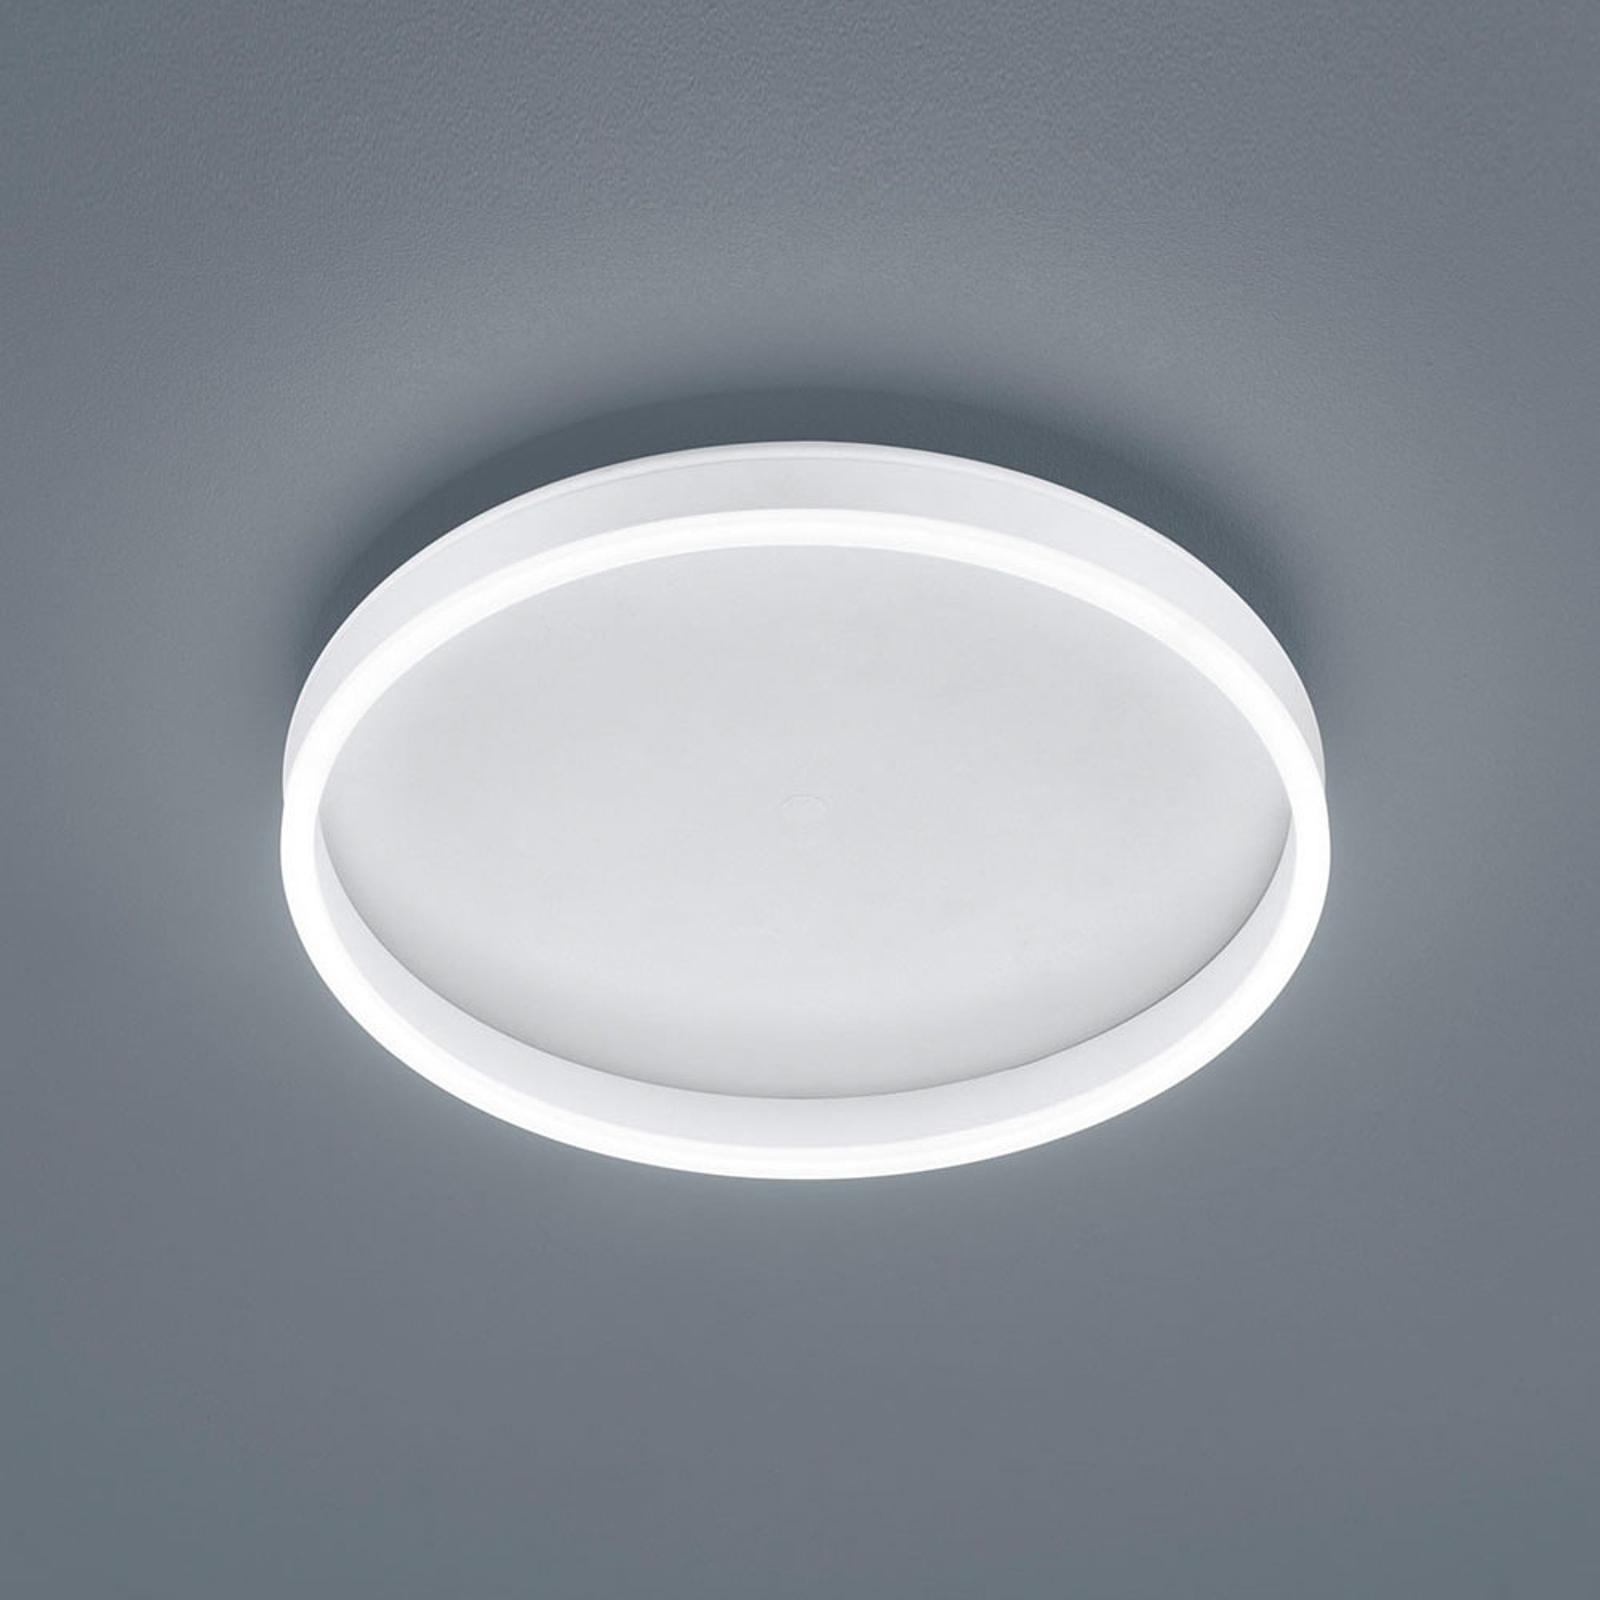 Helestra Sona LED-taklampe dimbar, Ø40cm hvit